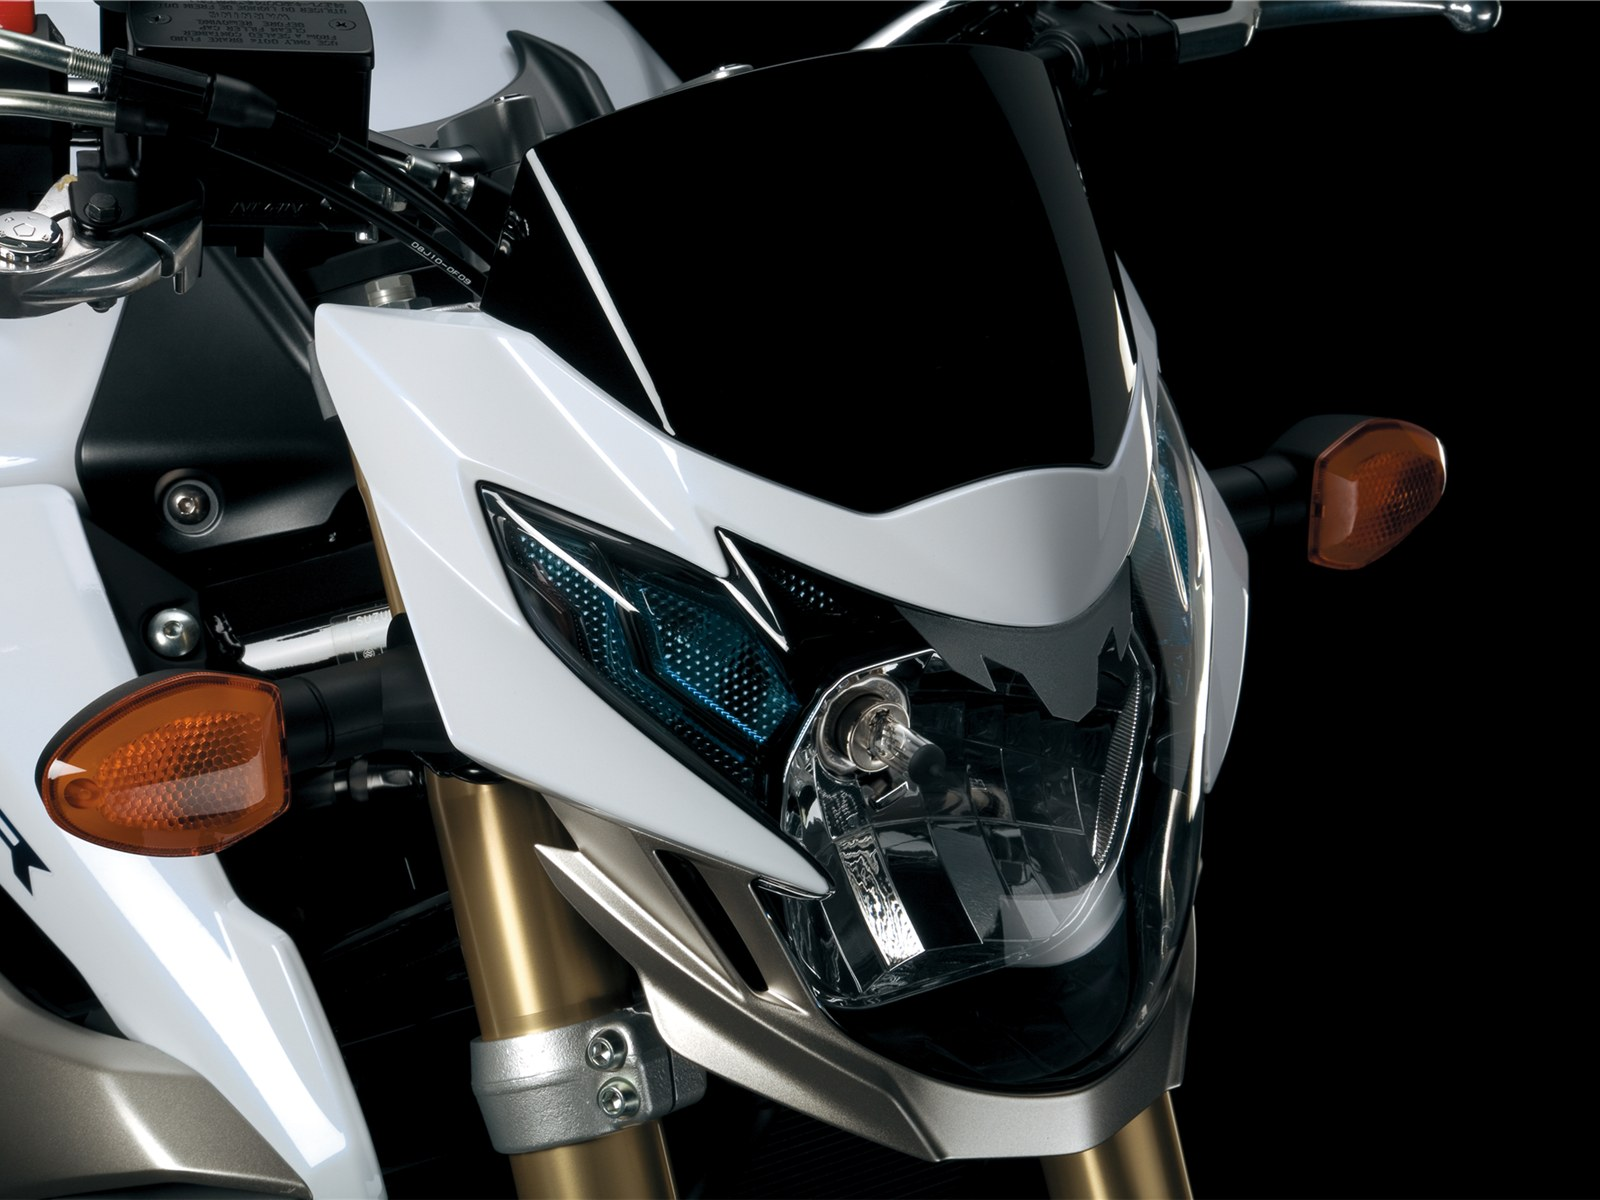 http://3.bp.blogspot.com/-A0PtqE1kSZI/TeeoLoEKk6I/AAAAAAAAA5Q/3KdBdEwjlTg/s1600/2011-Suzuki-GSR750-Headlight.jpg